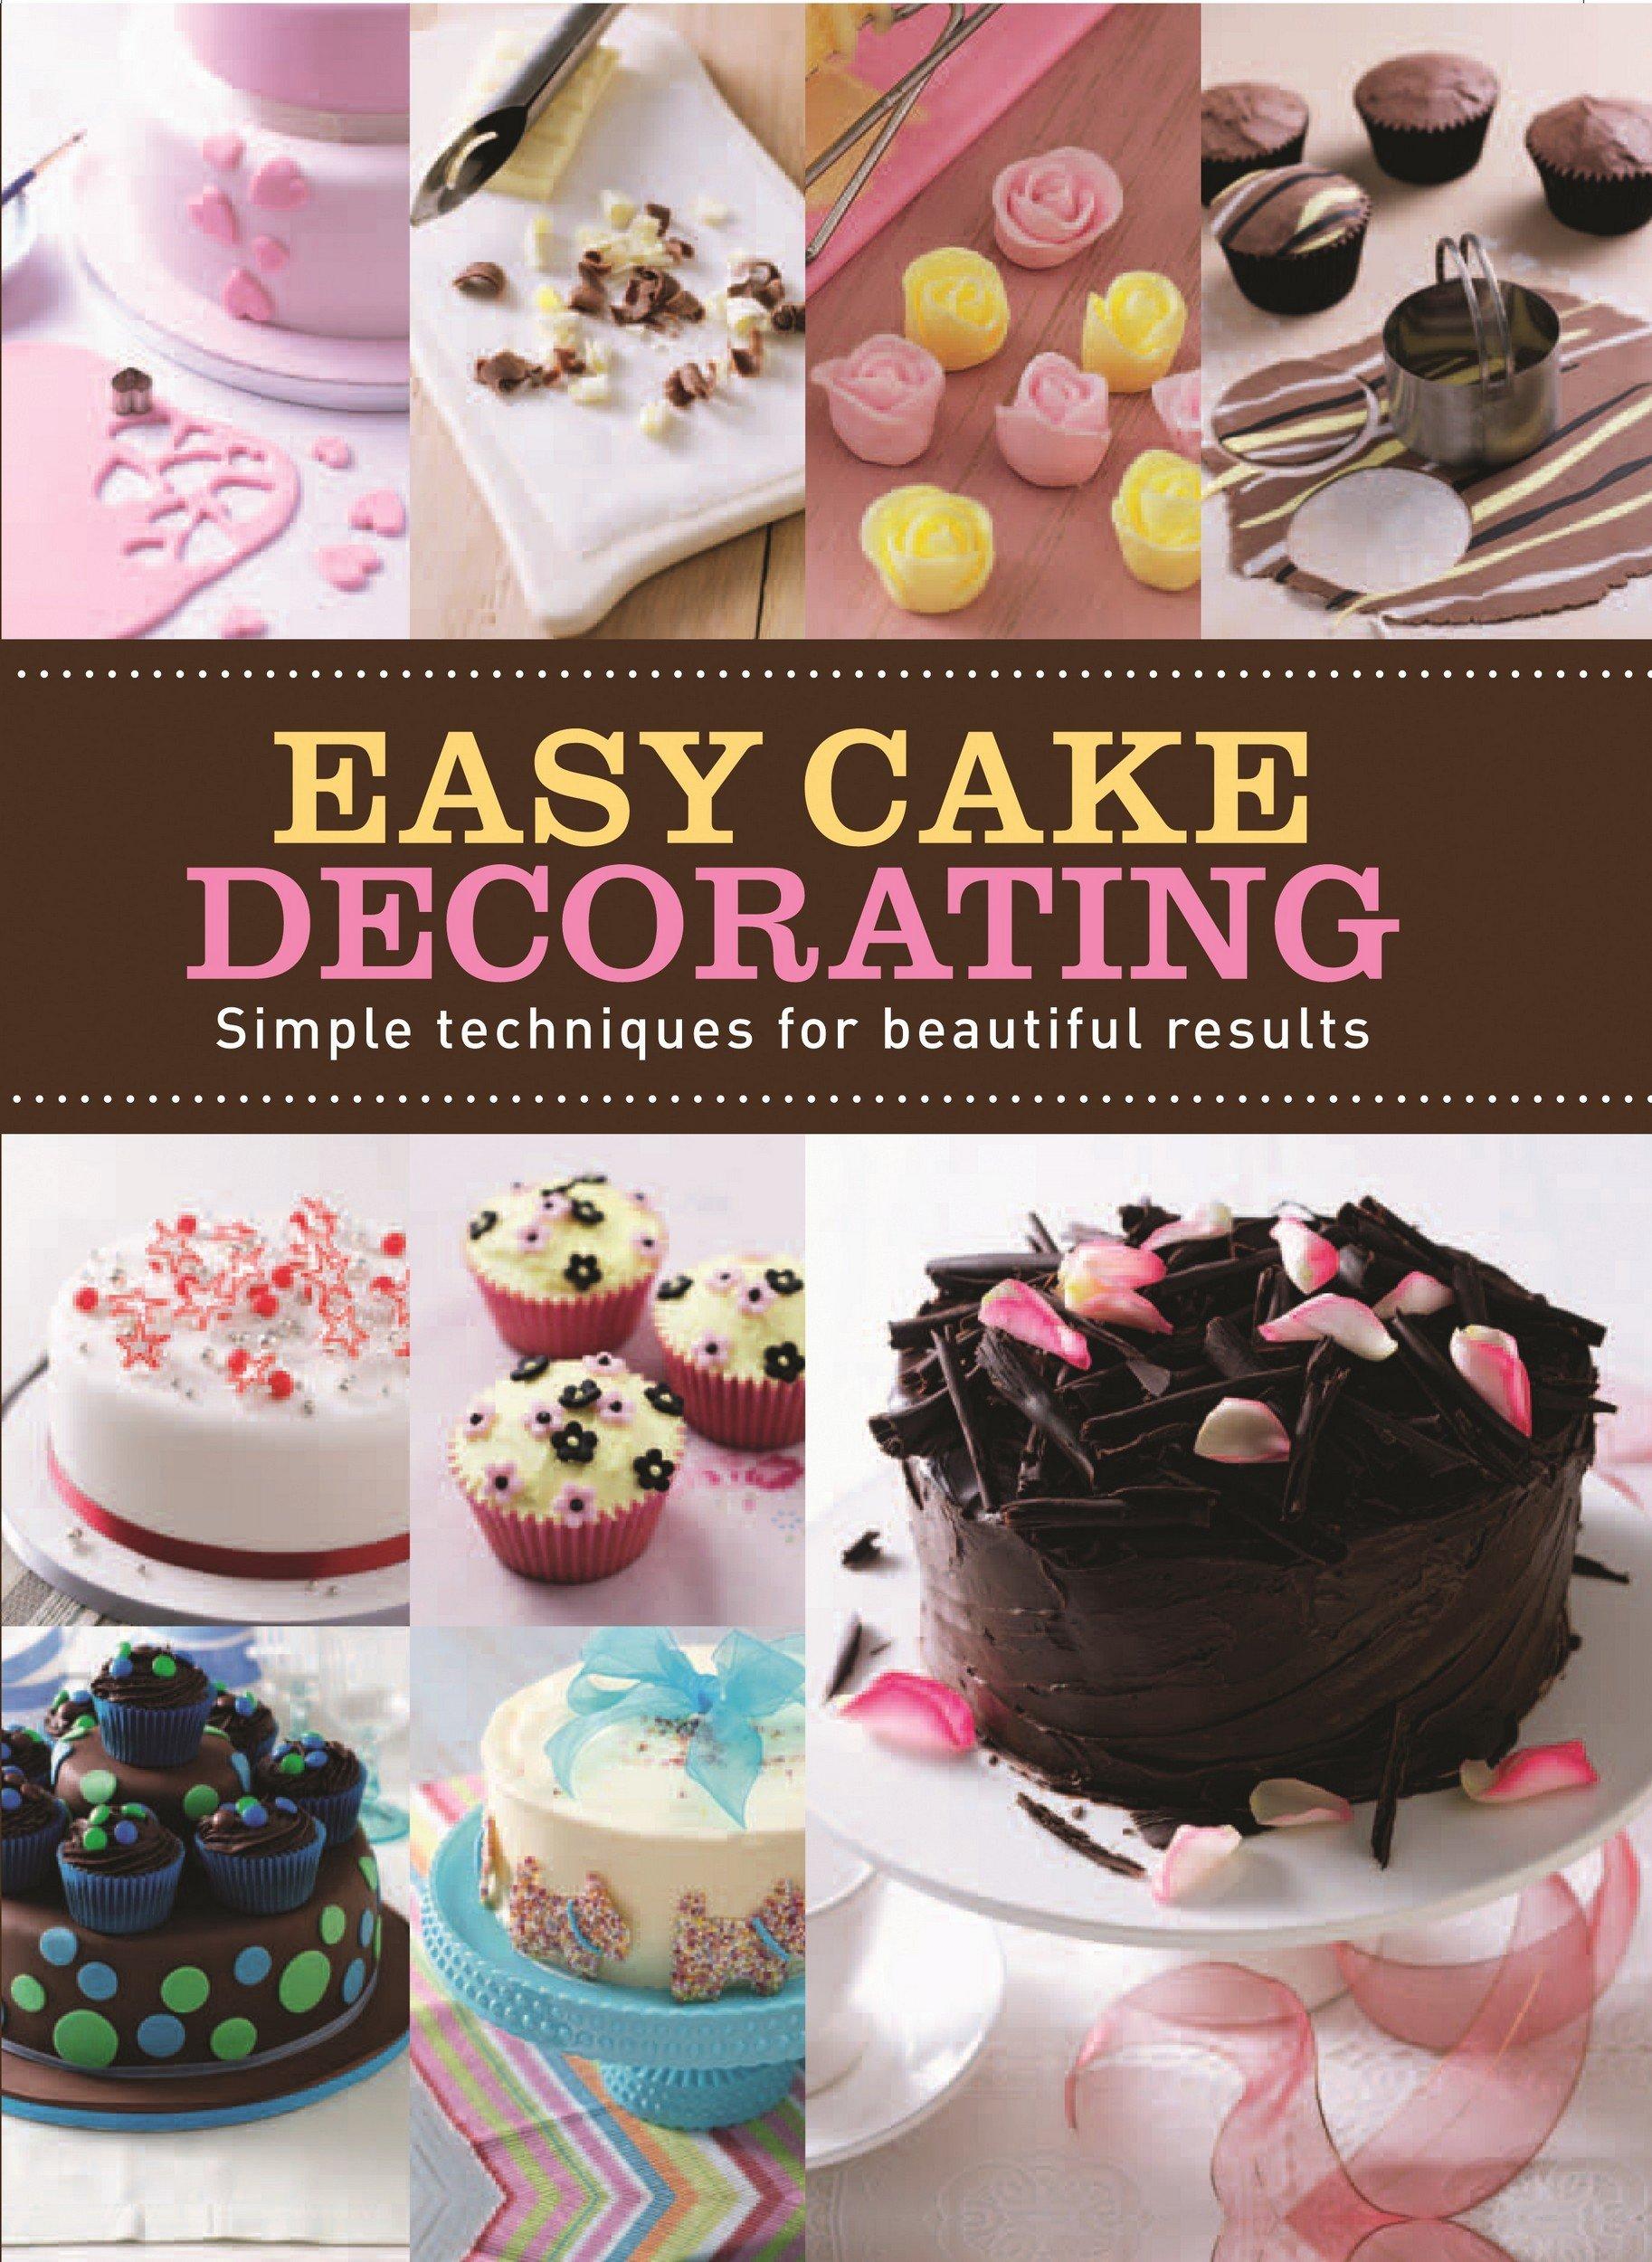 Easy Cake Decorating: Joanna Farrow: 9781445422947: Amazon.com: Books